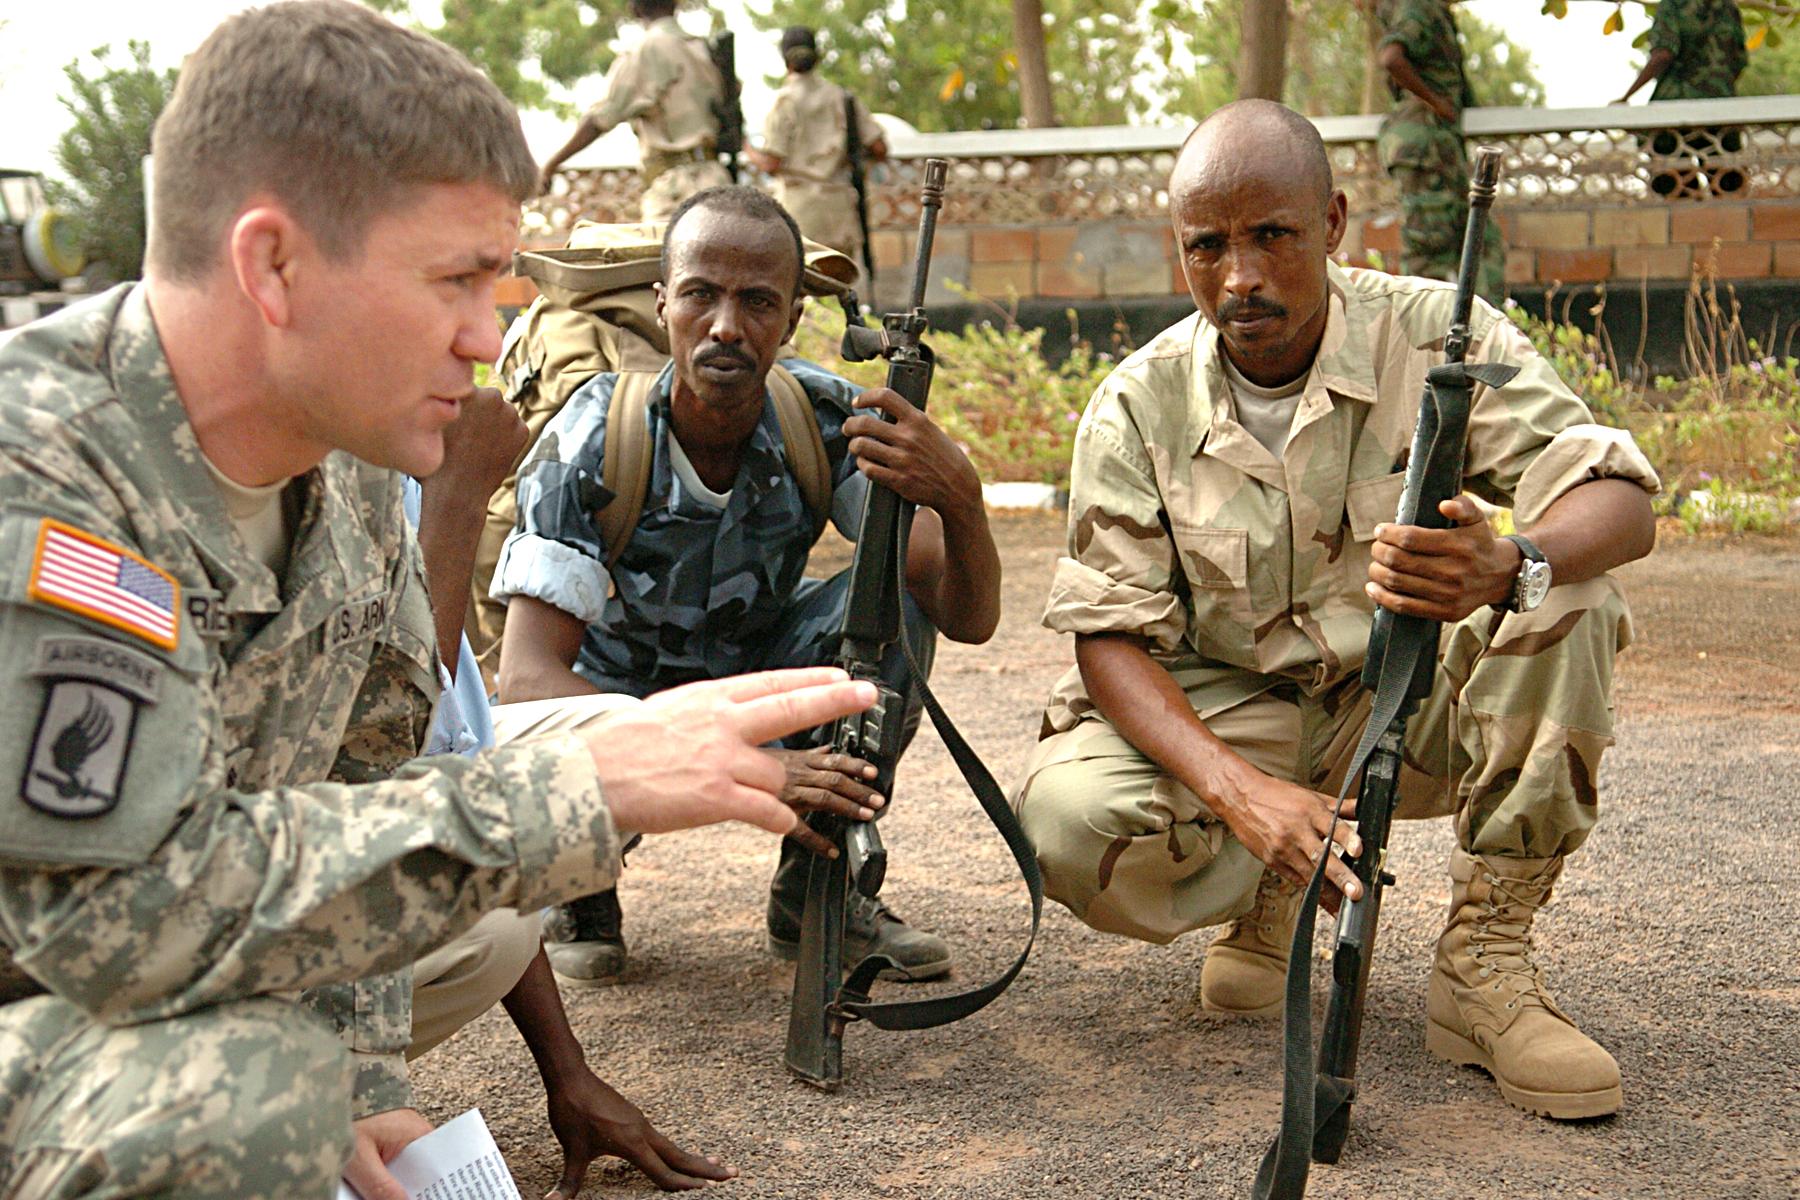 Djibouti U.SArmyAfricaSoldiers New Home